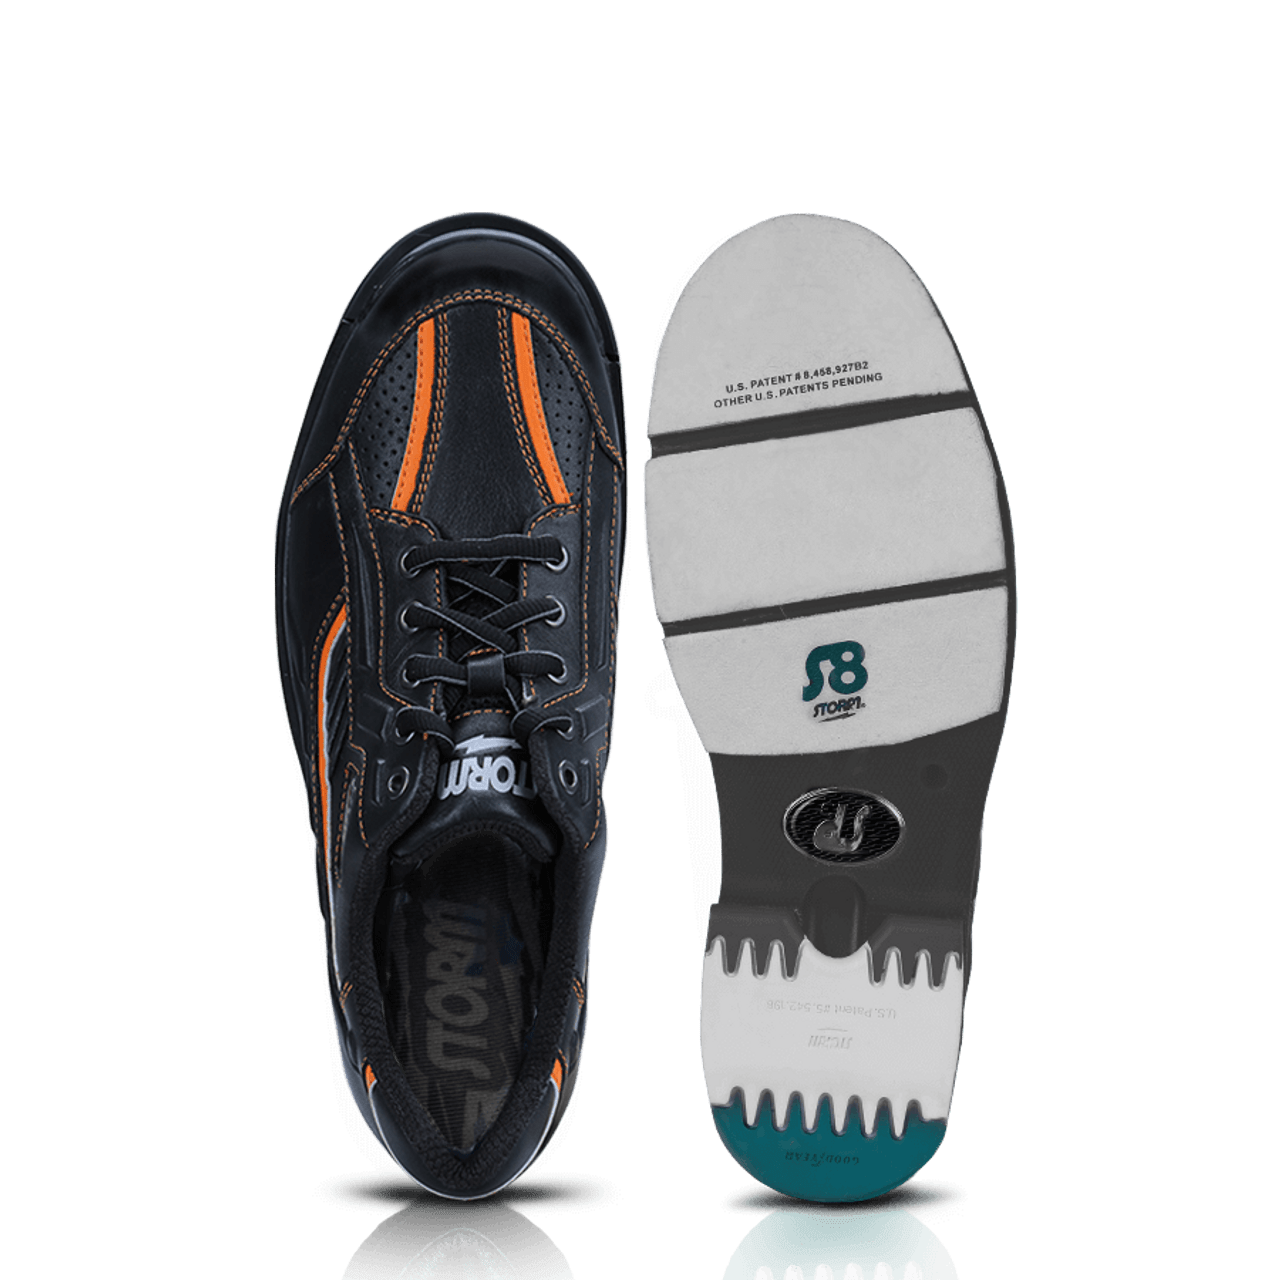 size 40 0a4e4 96a93 ... Storm SP3 Mens Bowling Shoes Black Orange - top and bottom